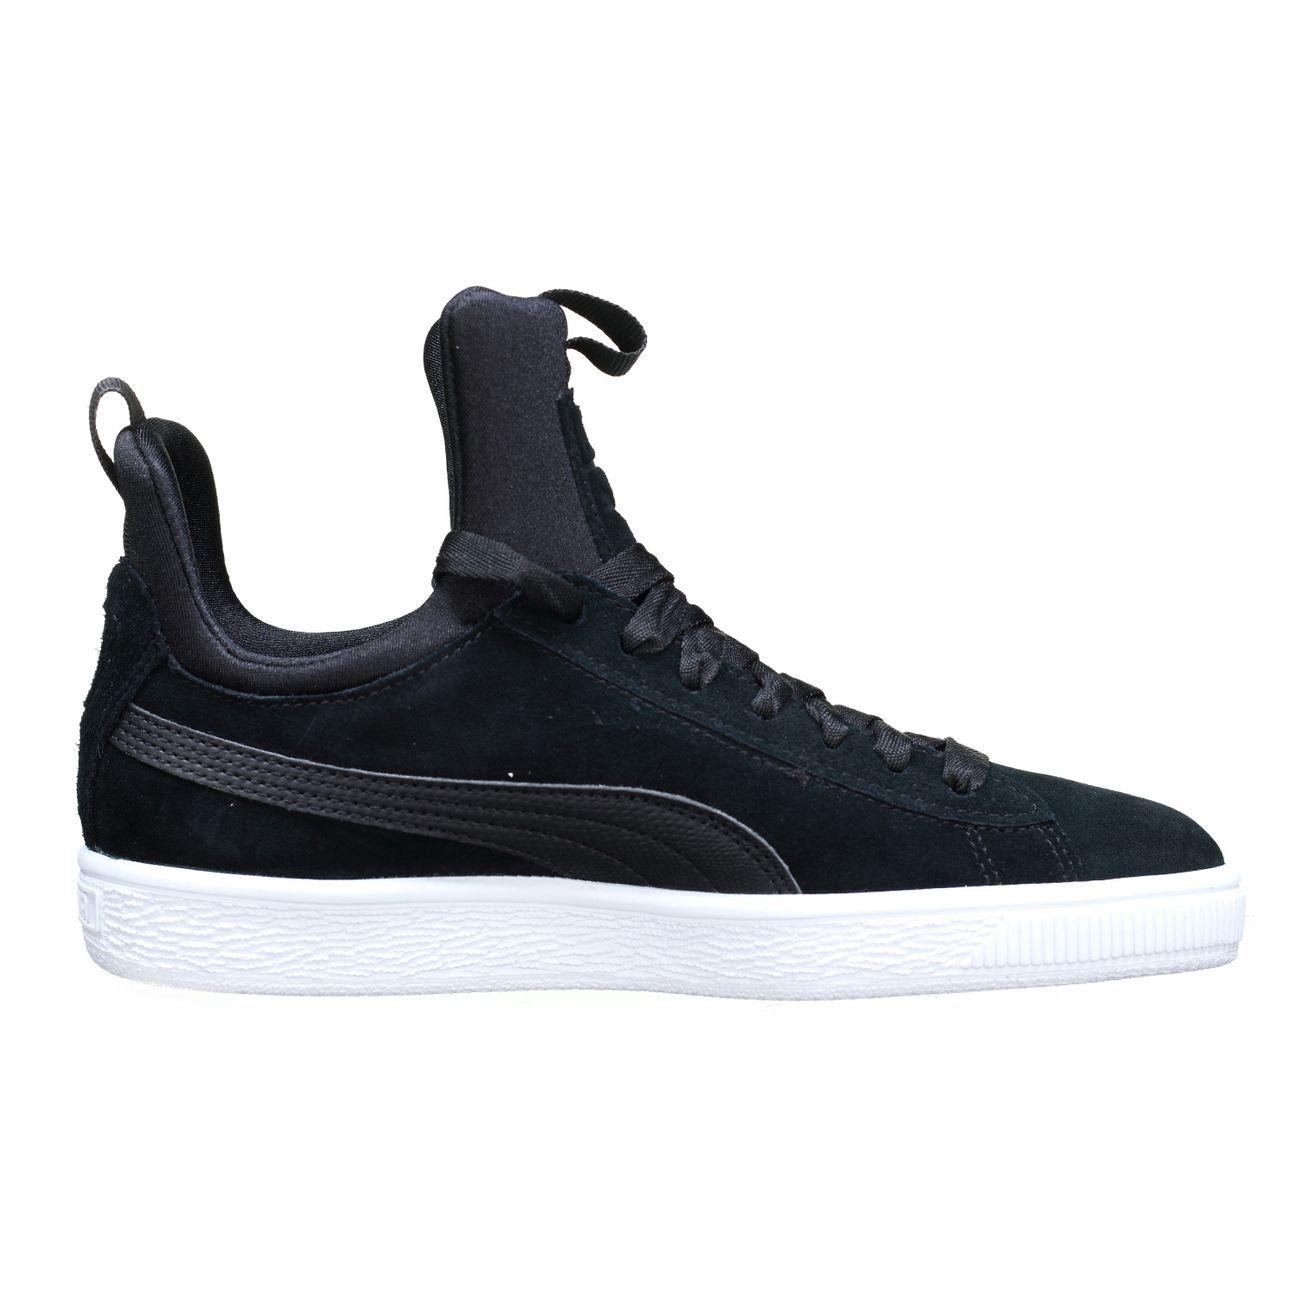 Wn Noir Suede Puma 36601003 ModeLifestyle S Homme Basket Fierce n8wOmyNP0v